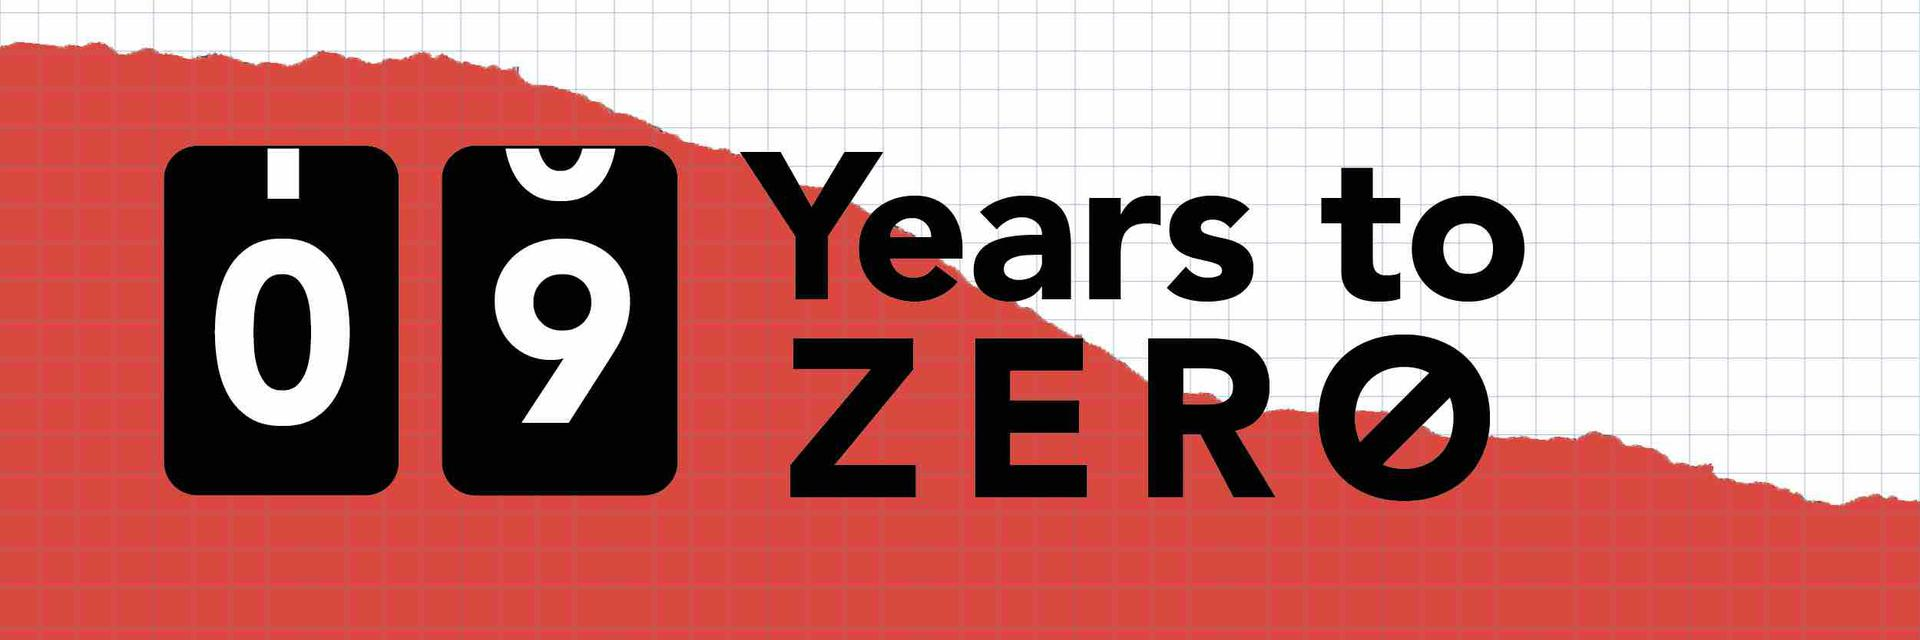 09 Years to ZERO newsletter banner